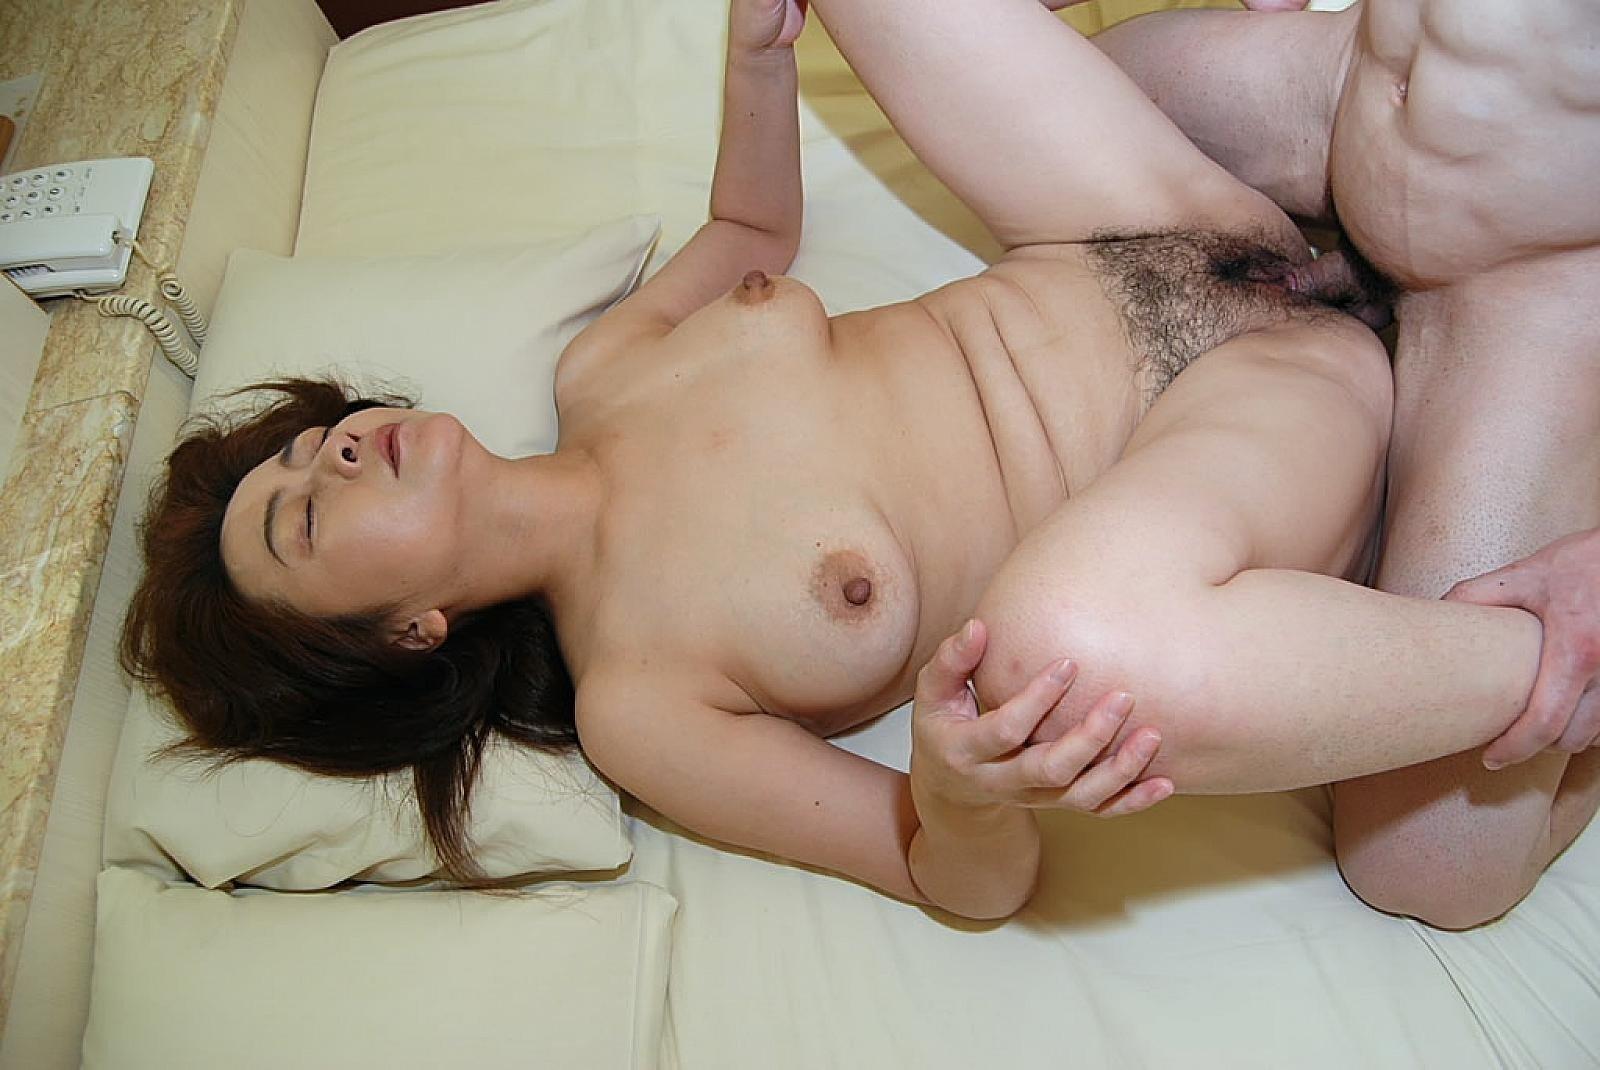 Japan x mom porn